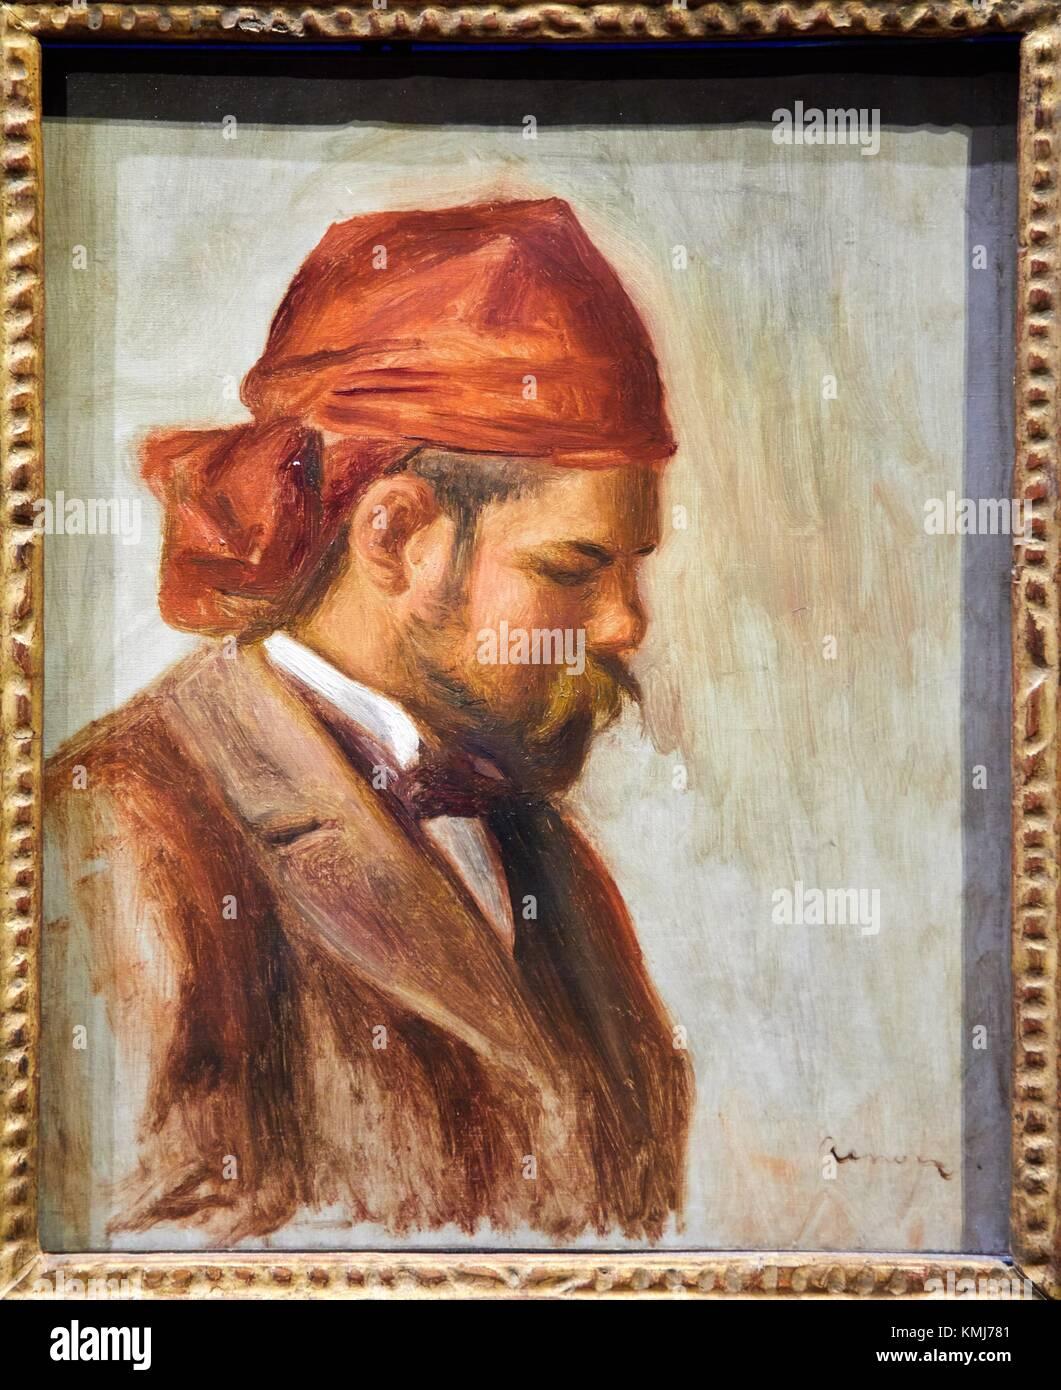 Portrait d´Ambroise Vollard au foulard rouge, 1899-1906, Pierre Auguste Renoir, Musee d´Art Moderne, Troyes, - Stock Image